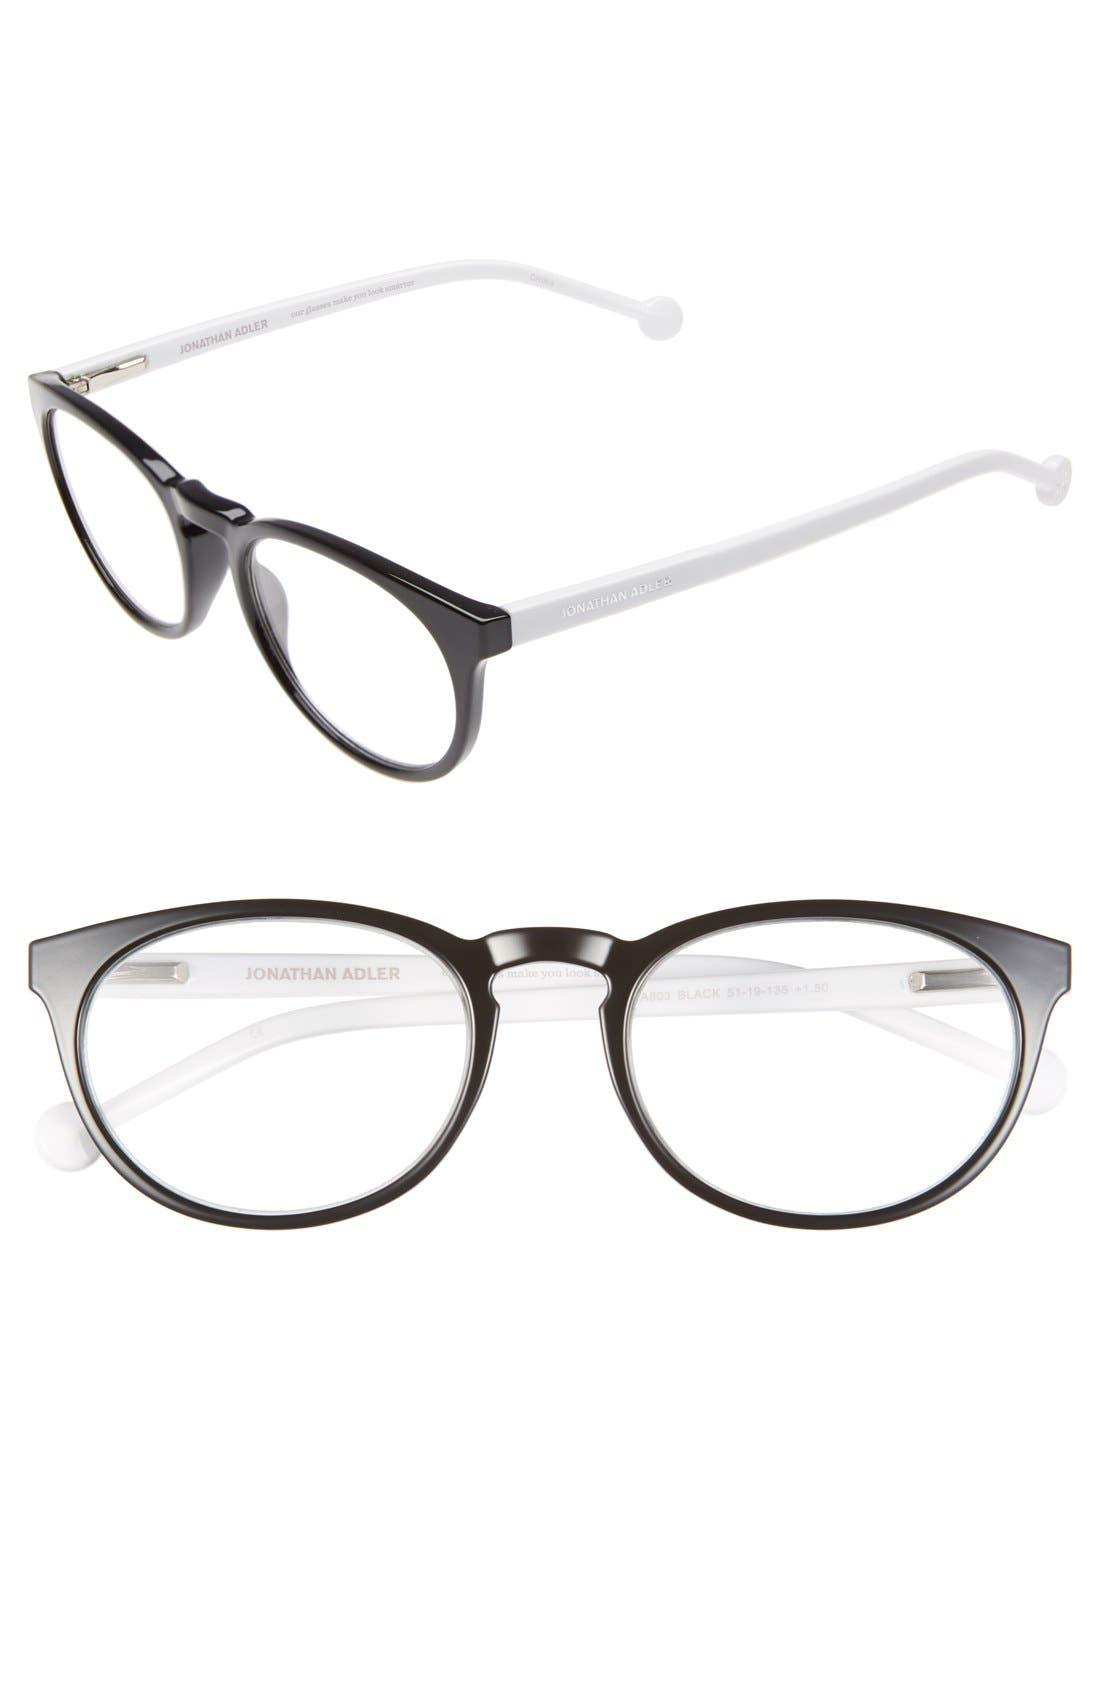 '803' 51mm Reading Glasses,                             Main thumbnail 1, color,                             001